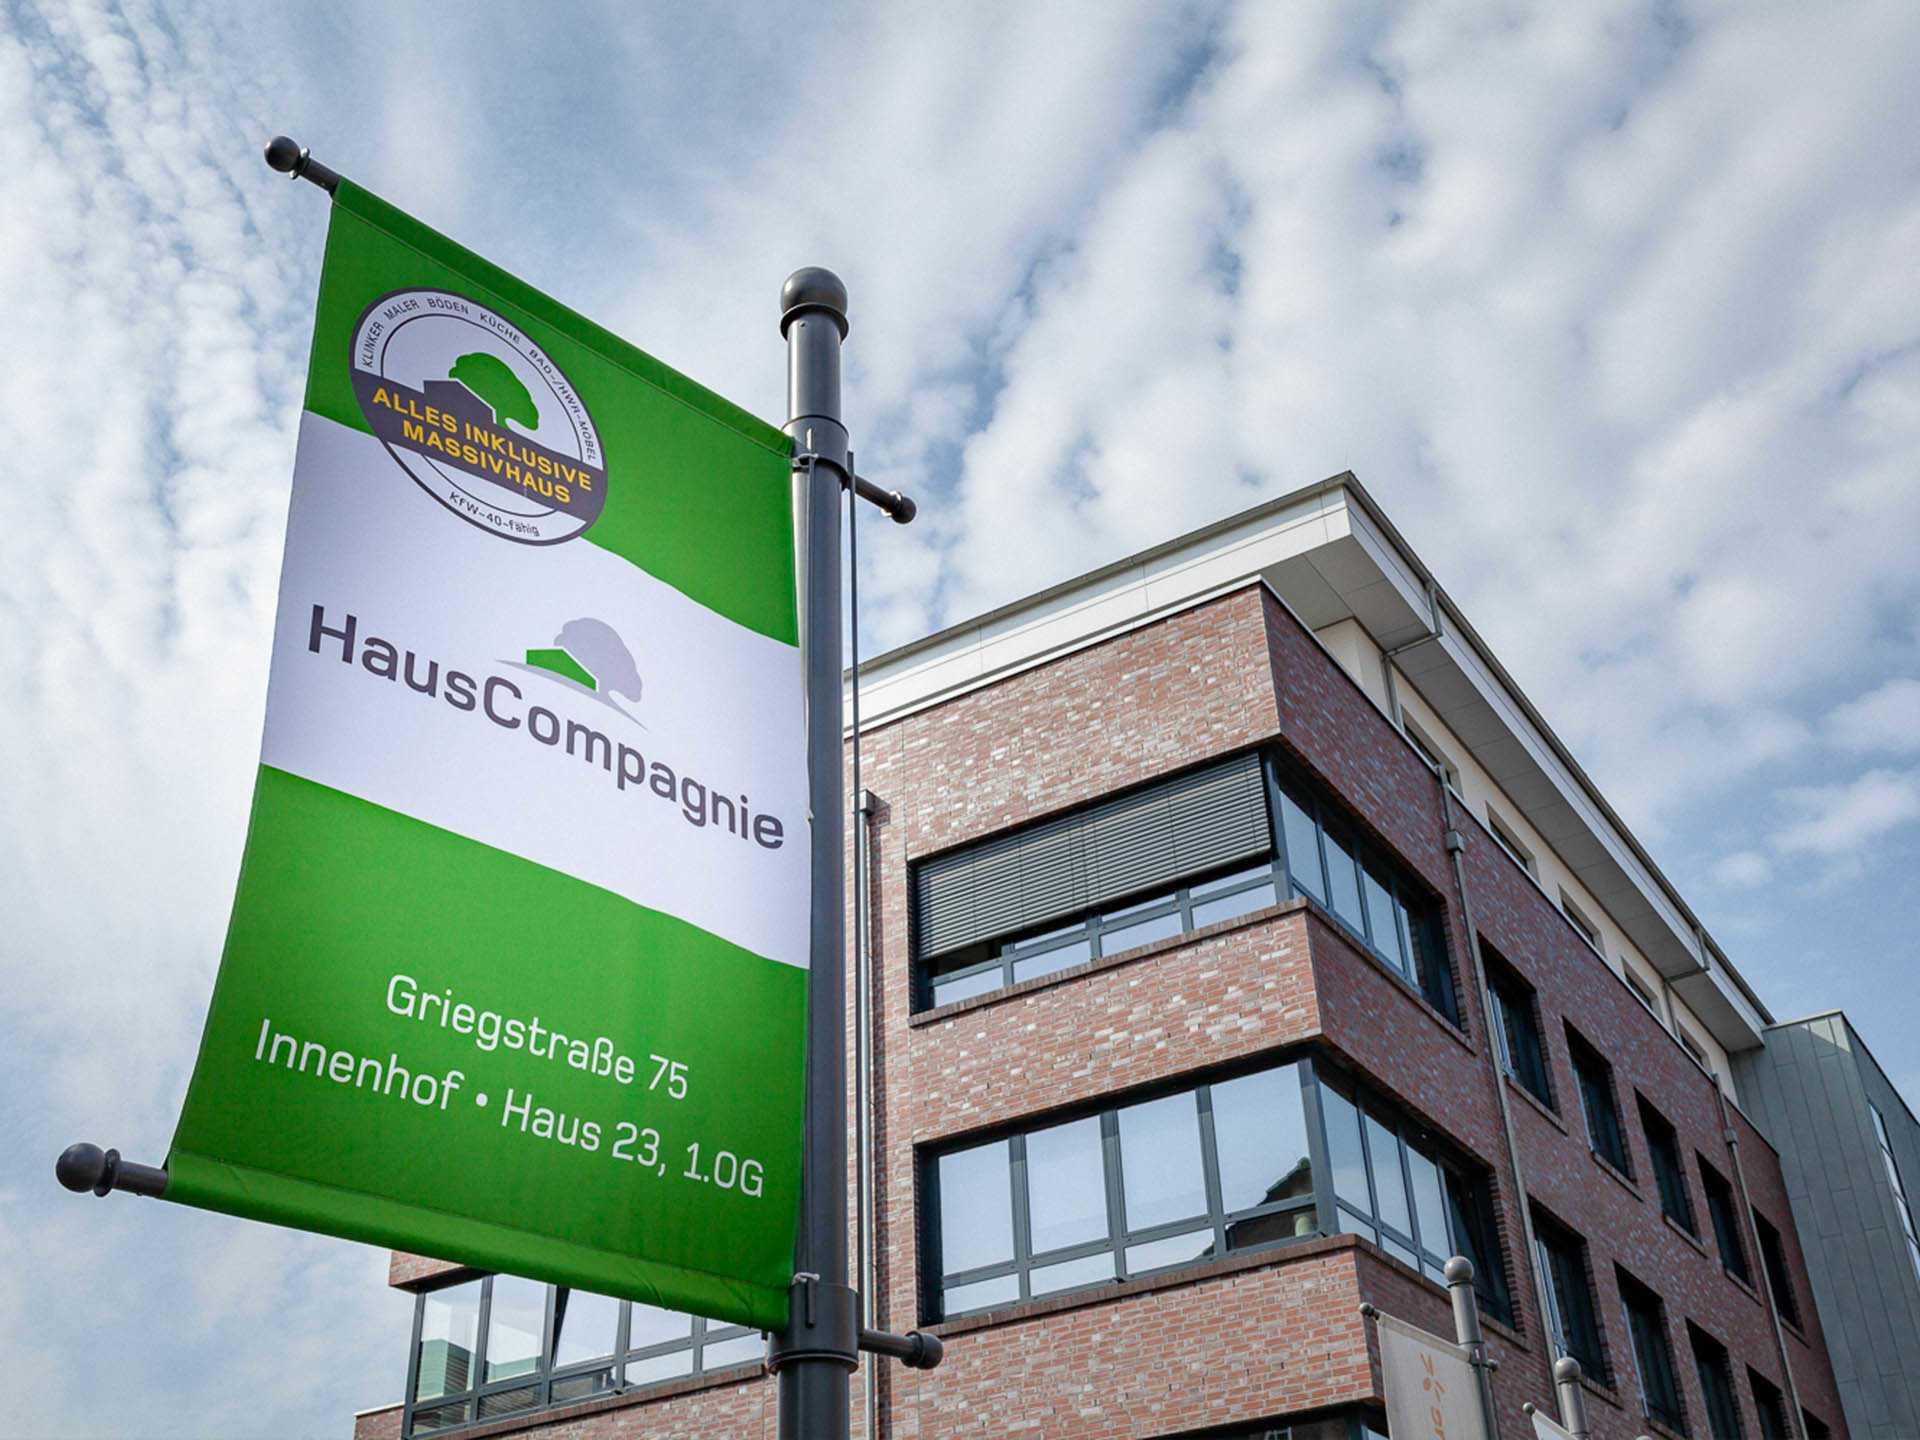 Die HausCompagnie - Firmensitz